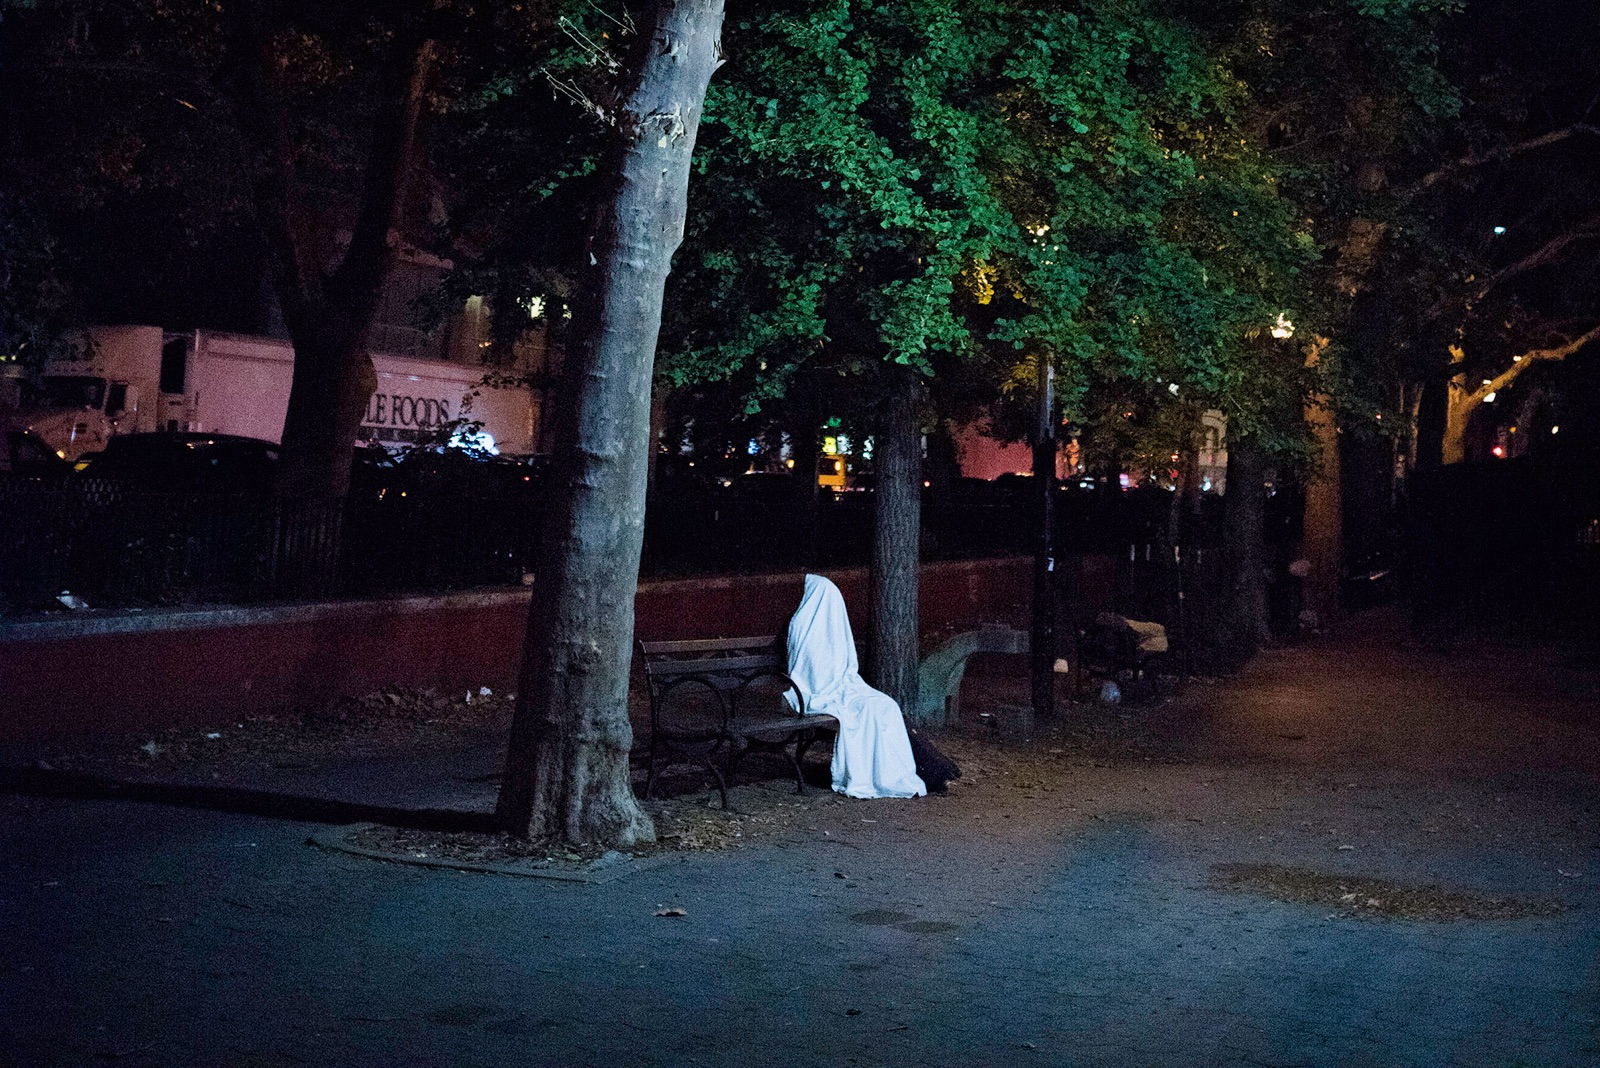 new-york-city-street-photography-collective-frank-multari-9